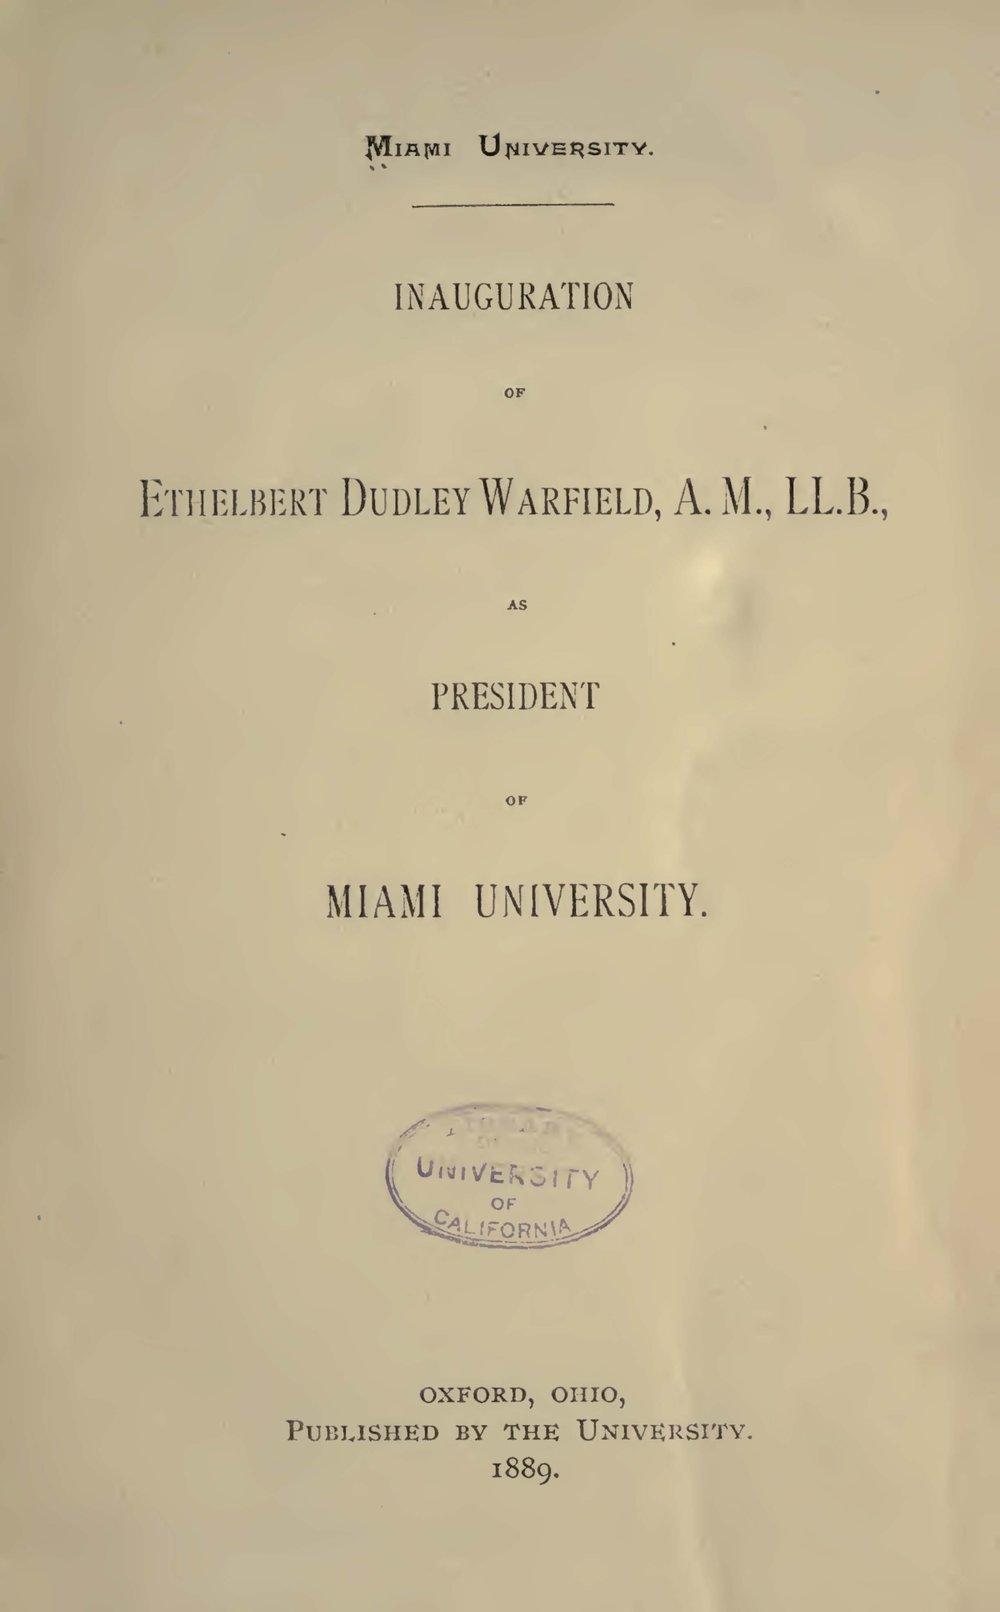 Warfield, Ethelbert Dudley, Inauguration of Ethelbert Dudley Warfield Title Page.jpg